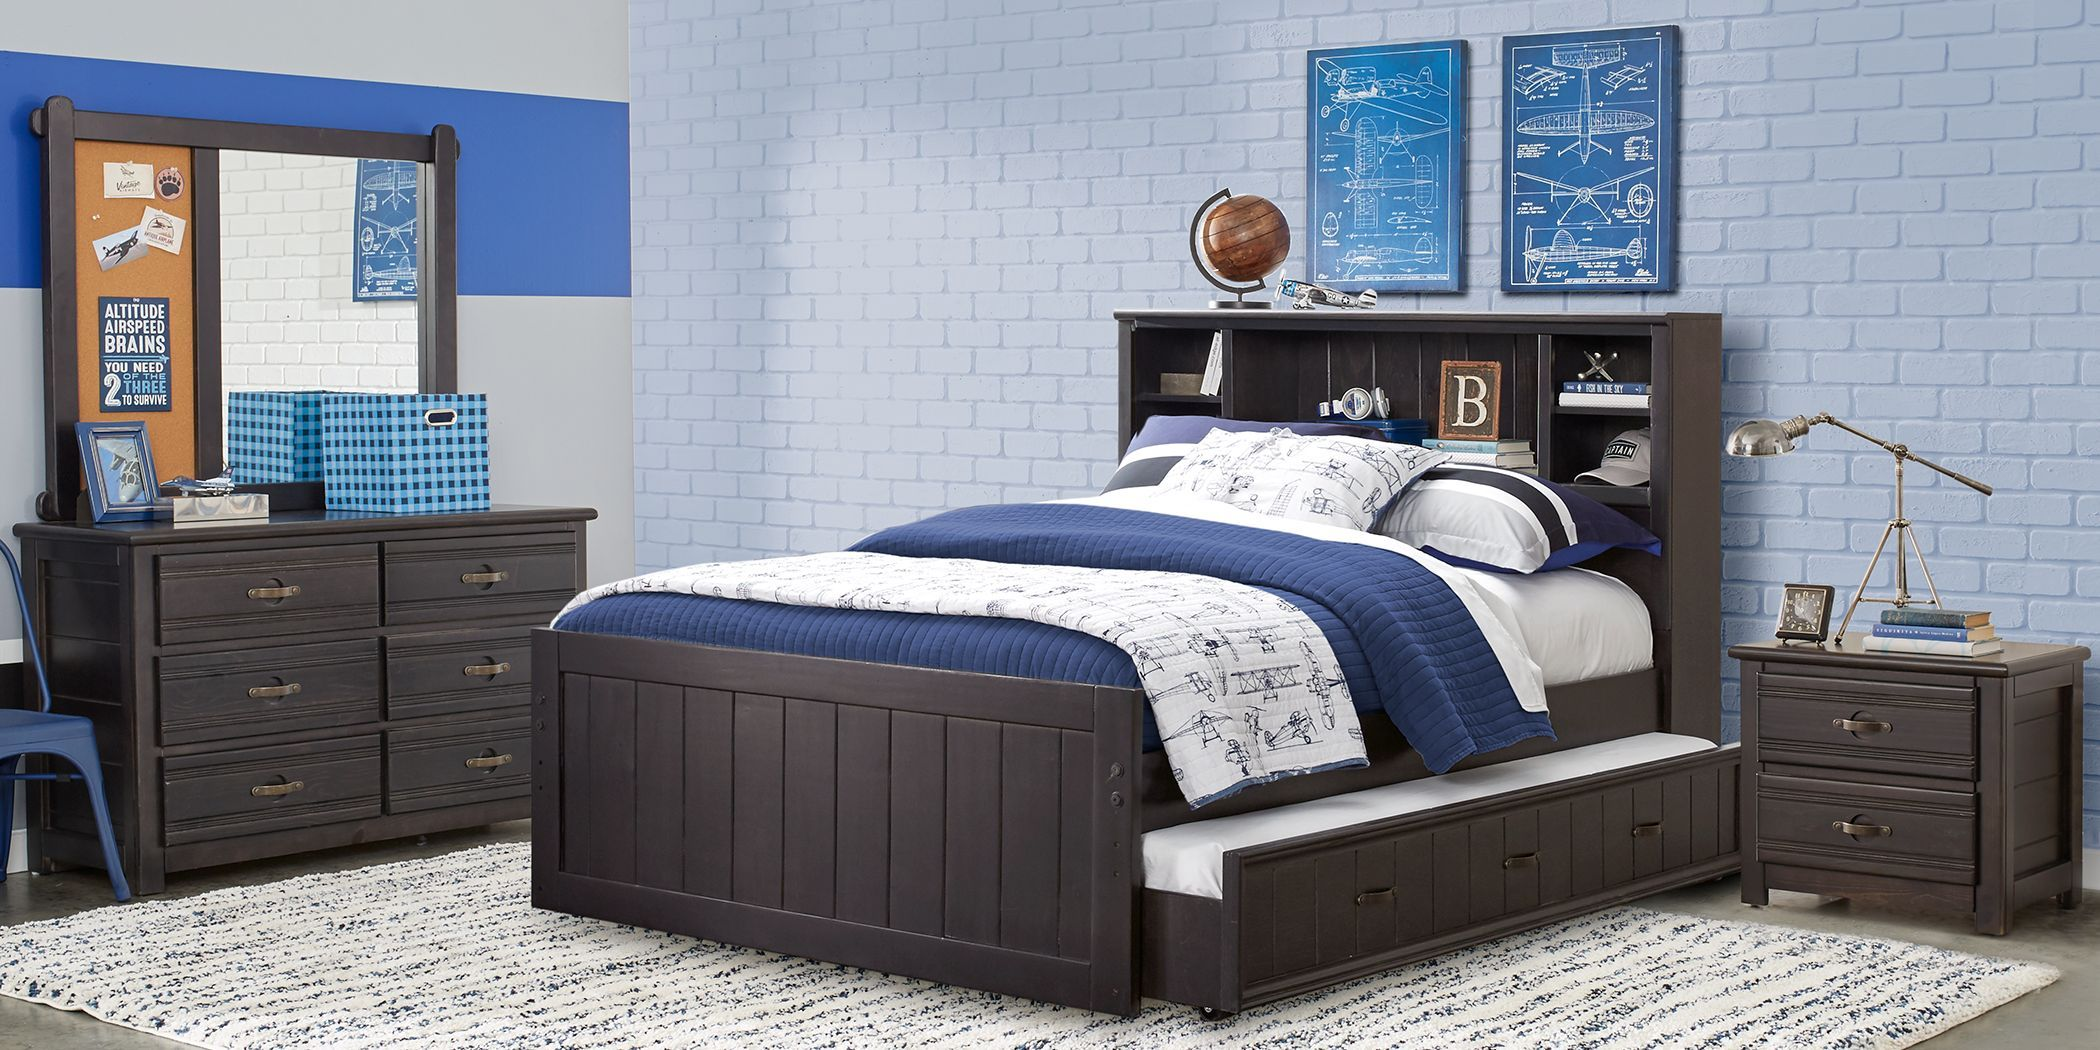 Kids Creekside Charcoal 5 Pc Full Bookcase Bedroom Bedroom